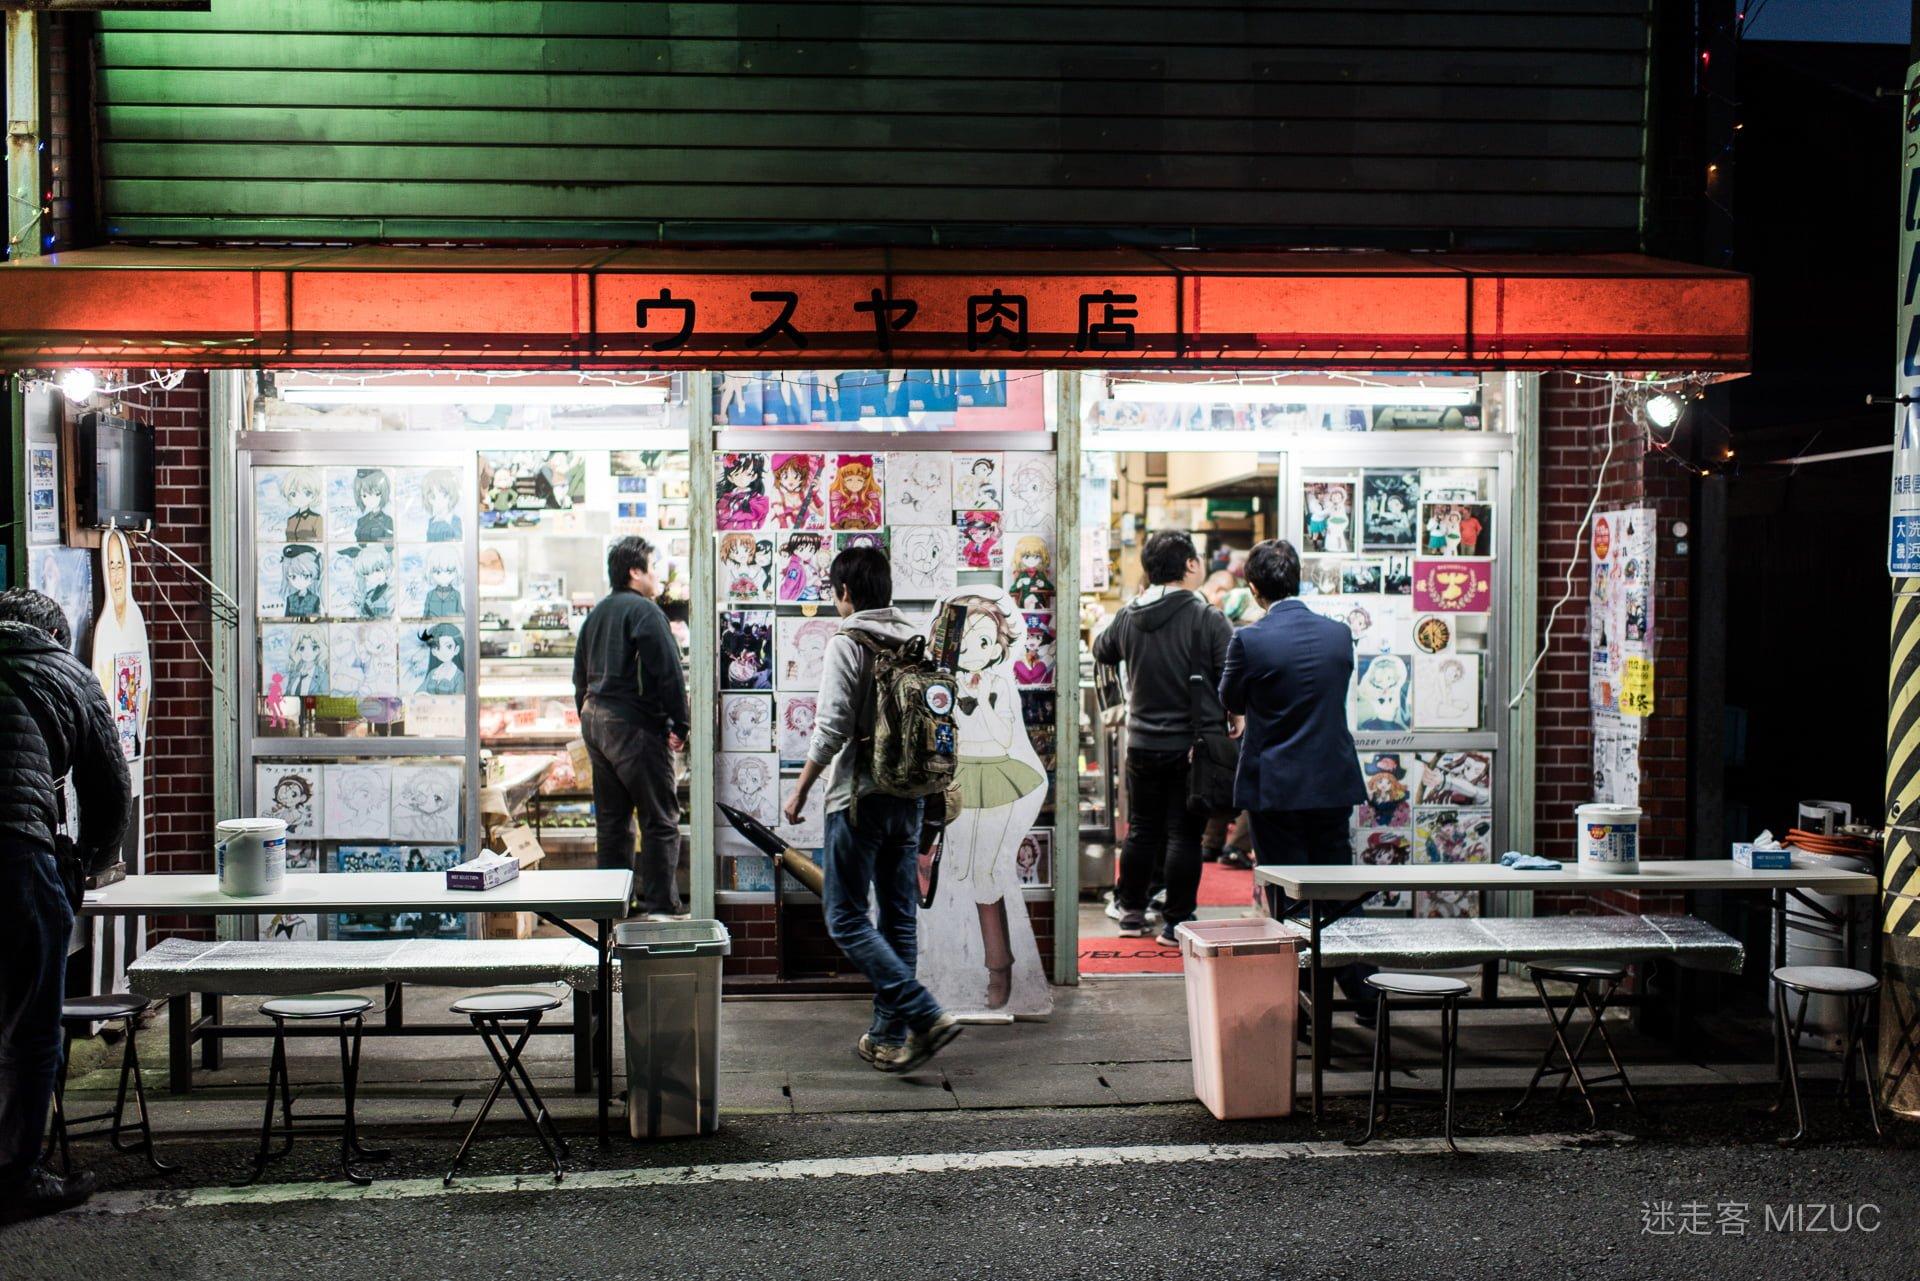 201711 Ibaraki Tochigi Gunma Japan Travel By RentalCar 8 日本自駕旅遊/北關東三縣「茨城、櫪木、群馬」秋天美食、溫泉與瀑布秘境百景(精選照片分享)